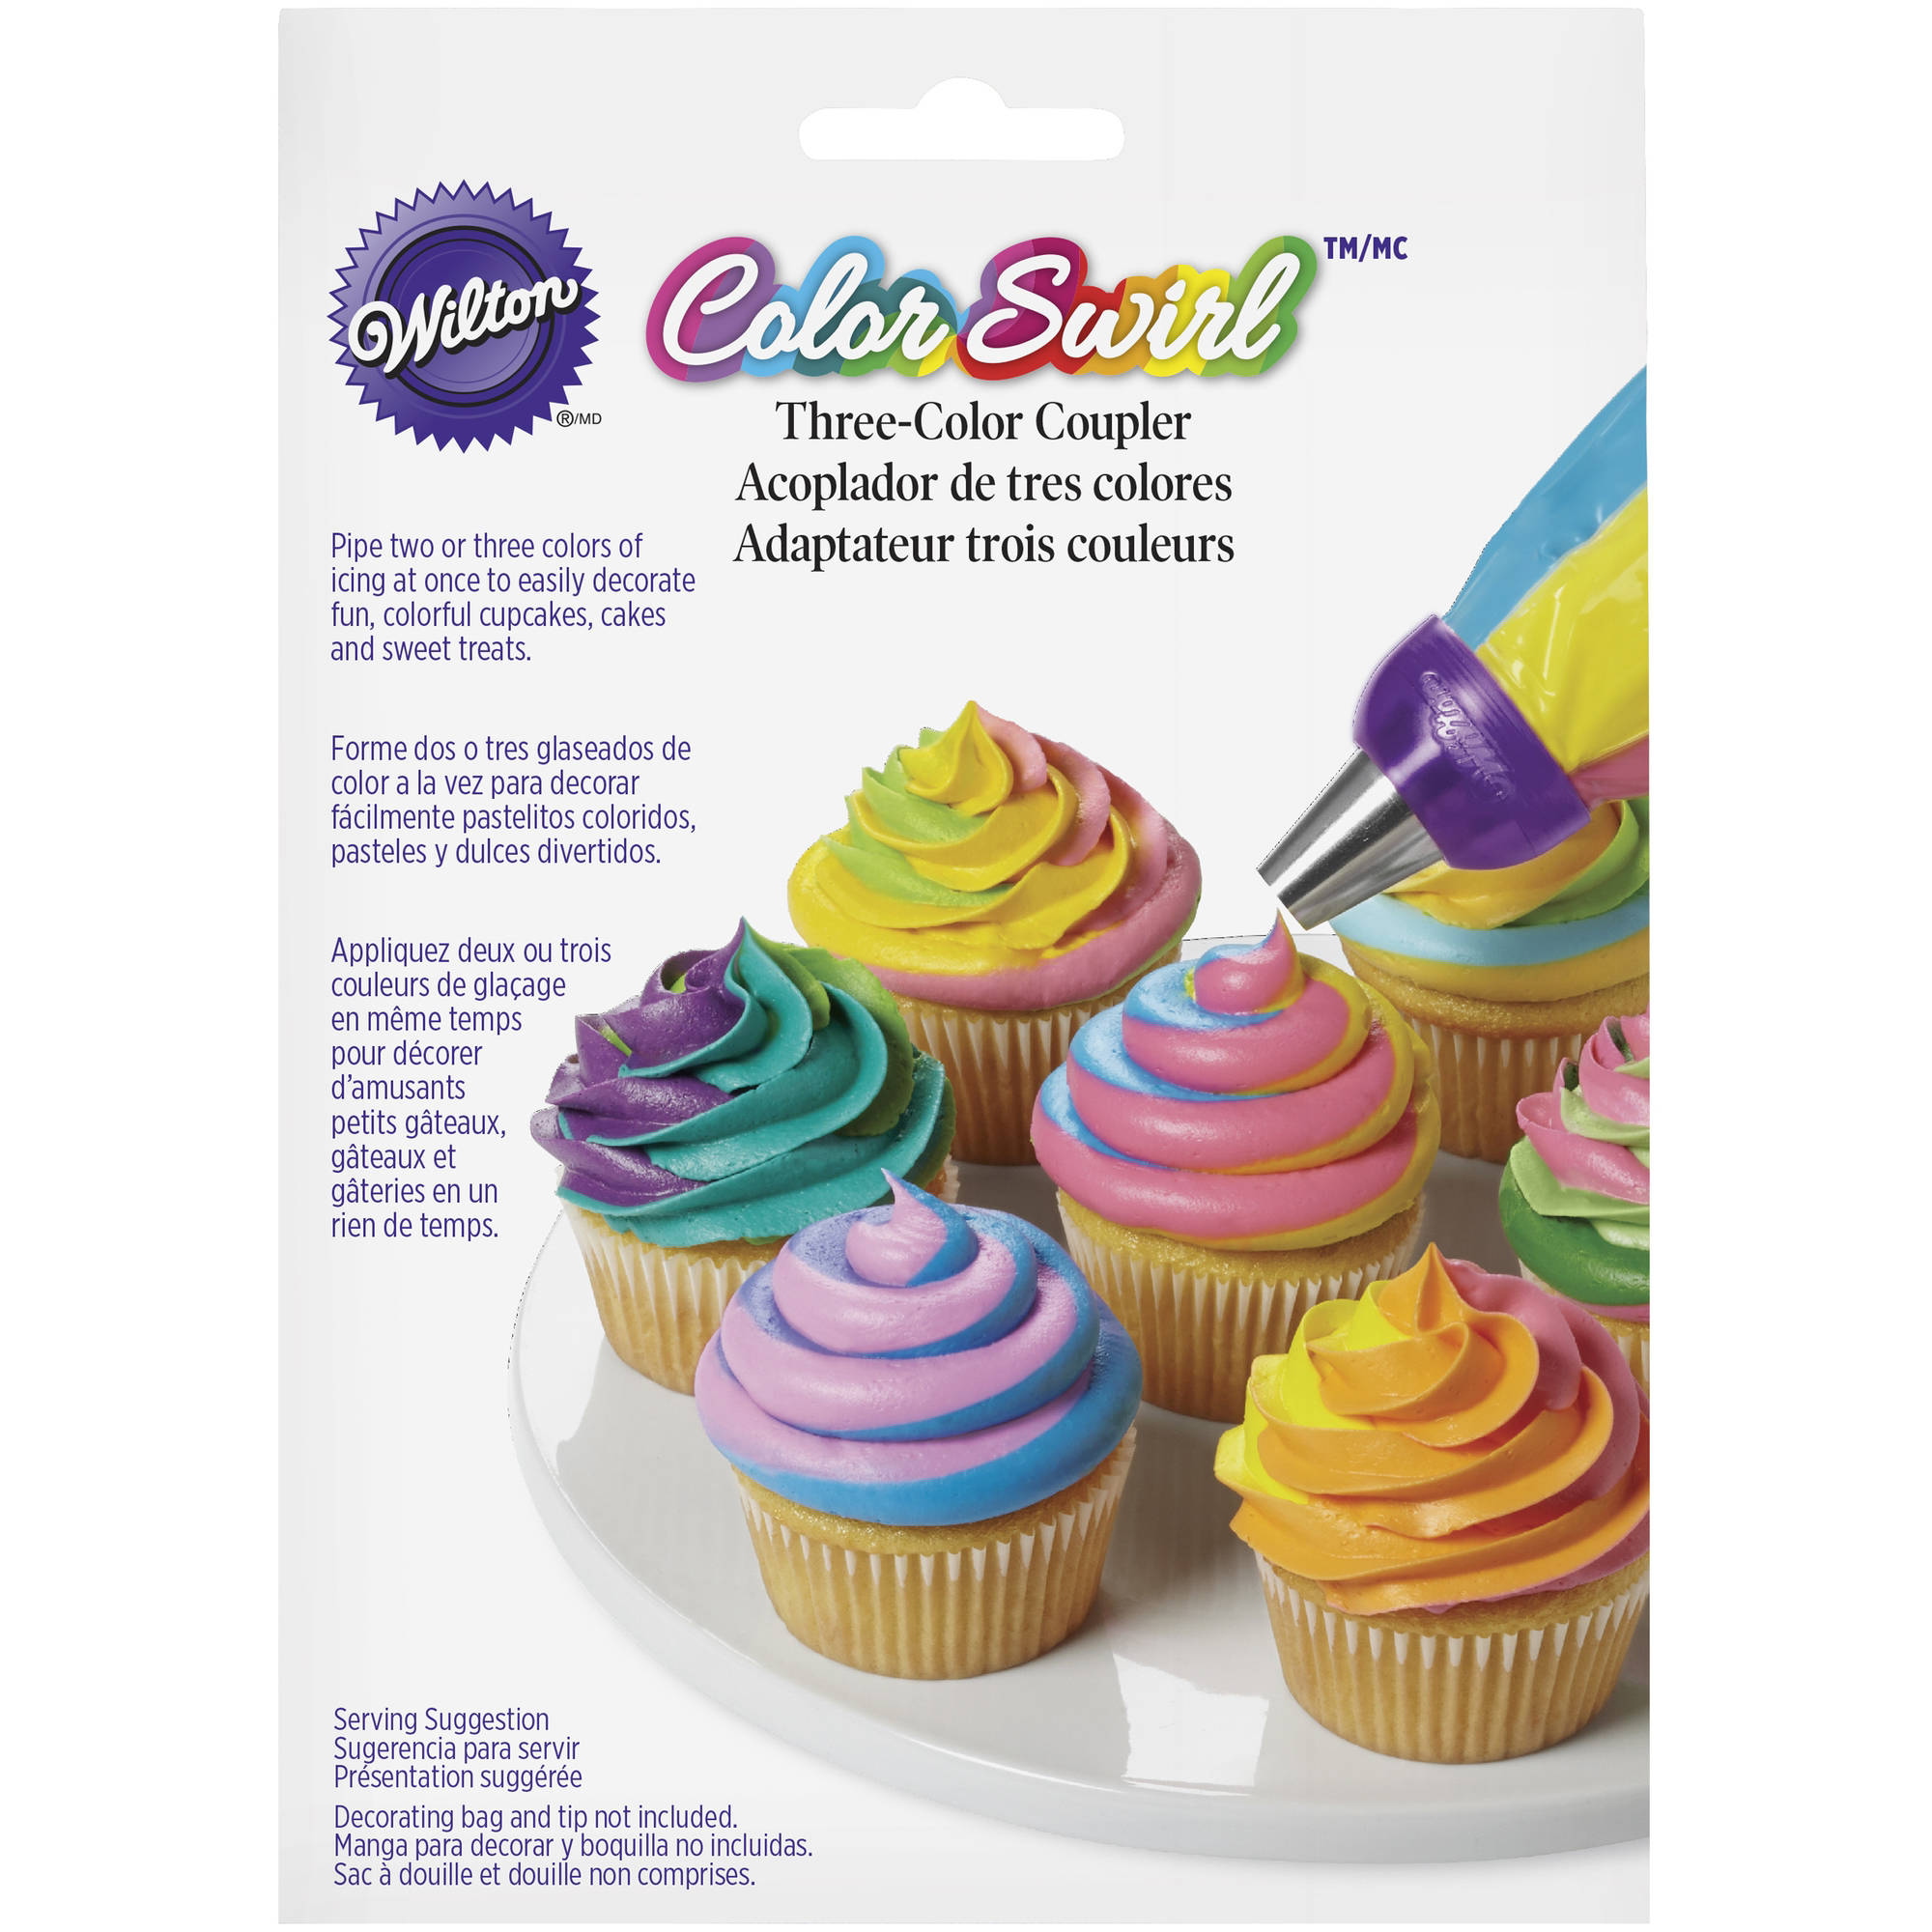 Wilton ColorSwirl 3-Color Icing Decorating Coupler, 6-Piece Set